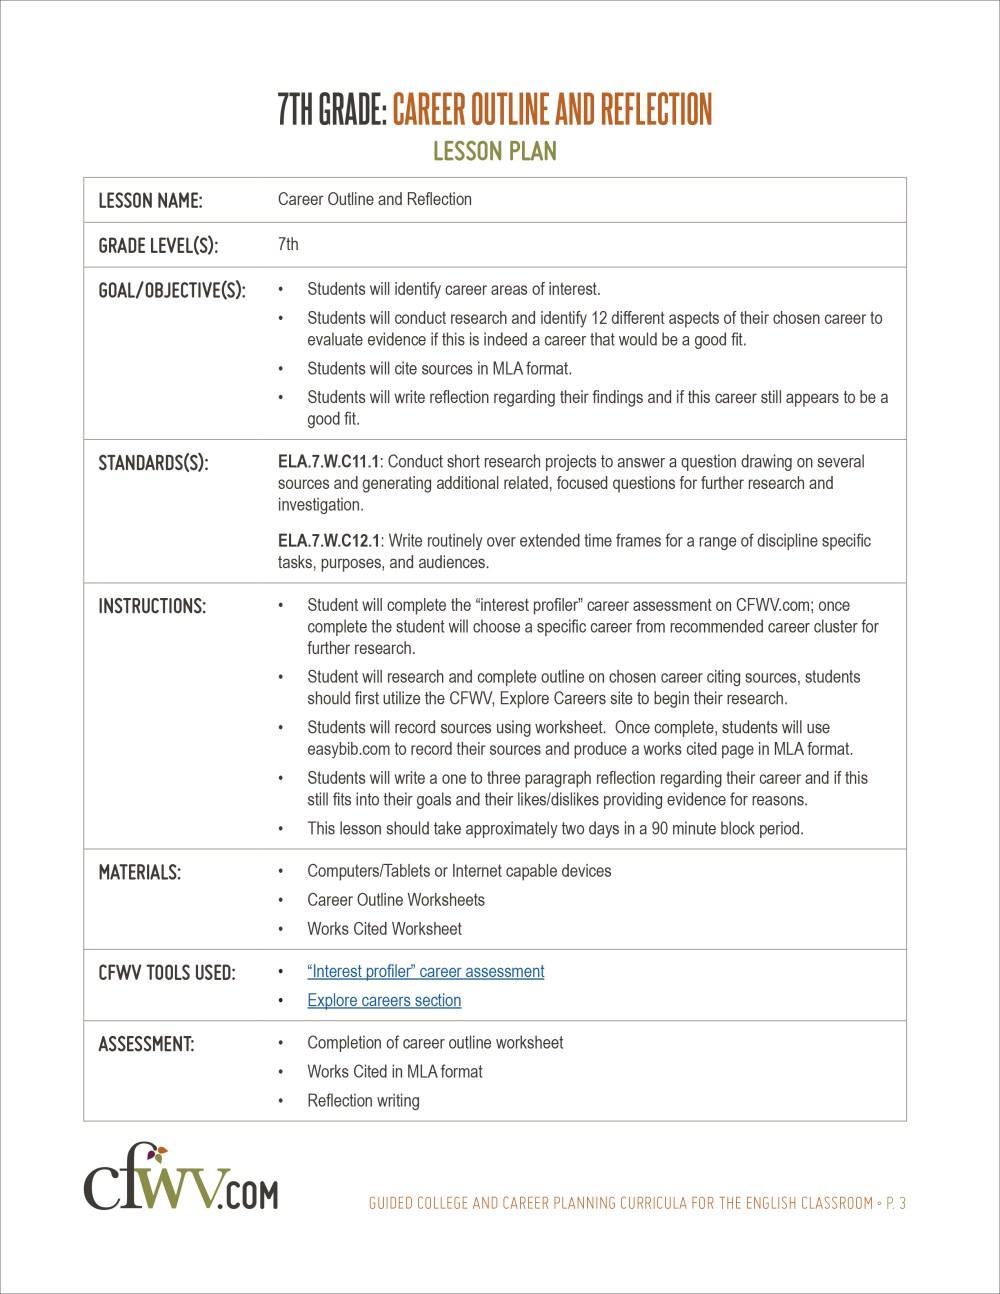 medium resolution of College and Career Planning English Curriculum Toolkit   CFWV Resources